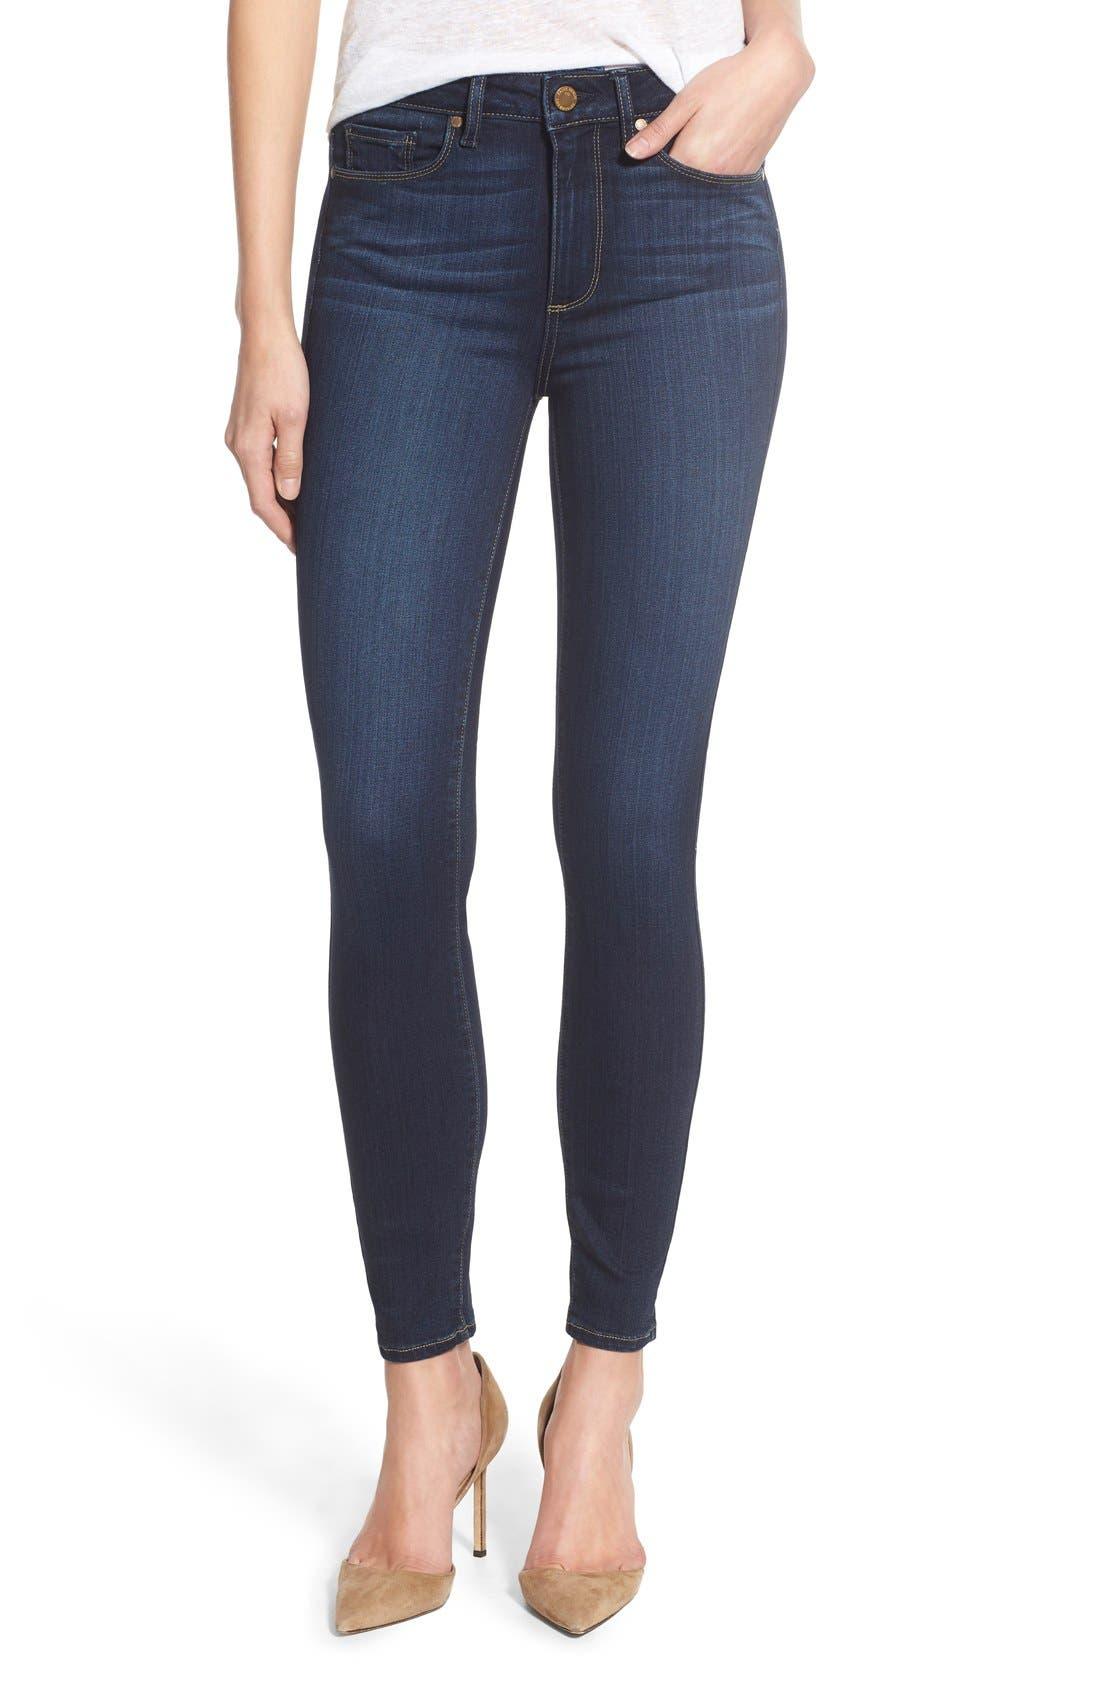 Main Image - PAIGE Transcend - Hoxton High Waist Ankle Ultra Skinny Jeans (Hartmann)